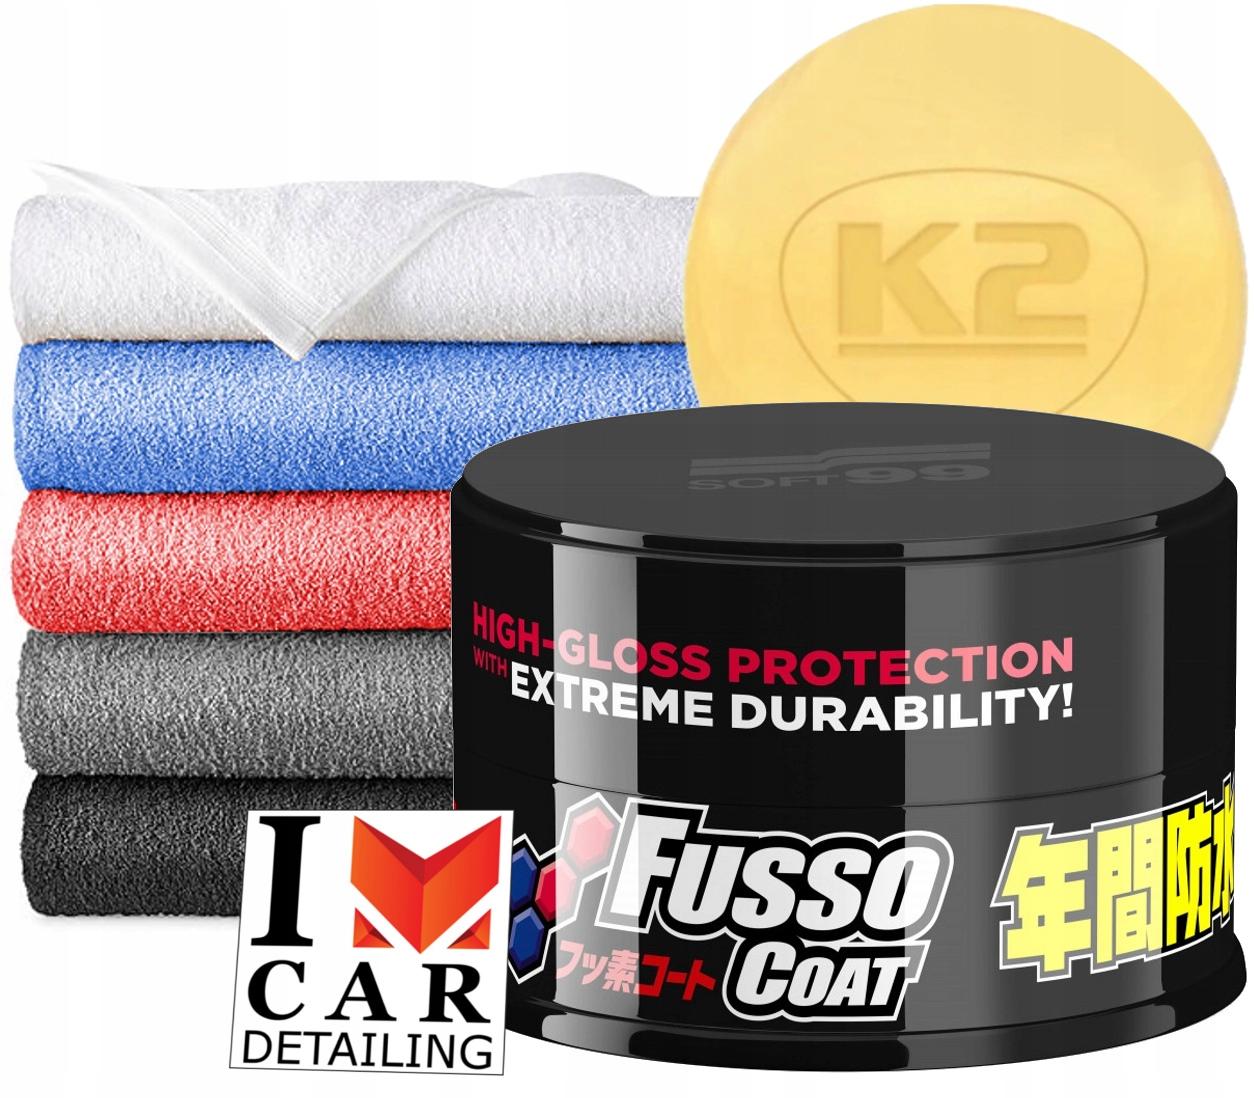 Soft99 Fusso пальто 12 месяцев воск Темная новая формула